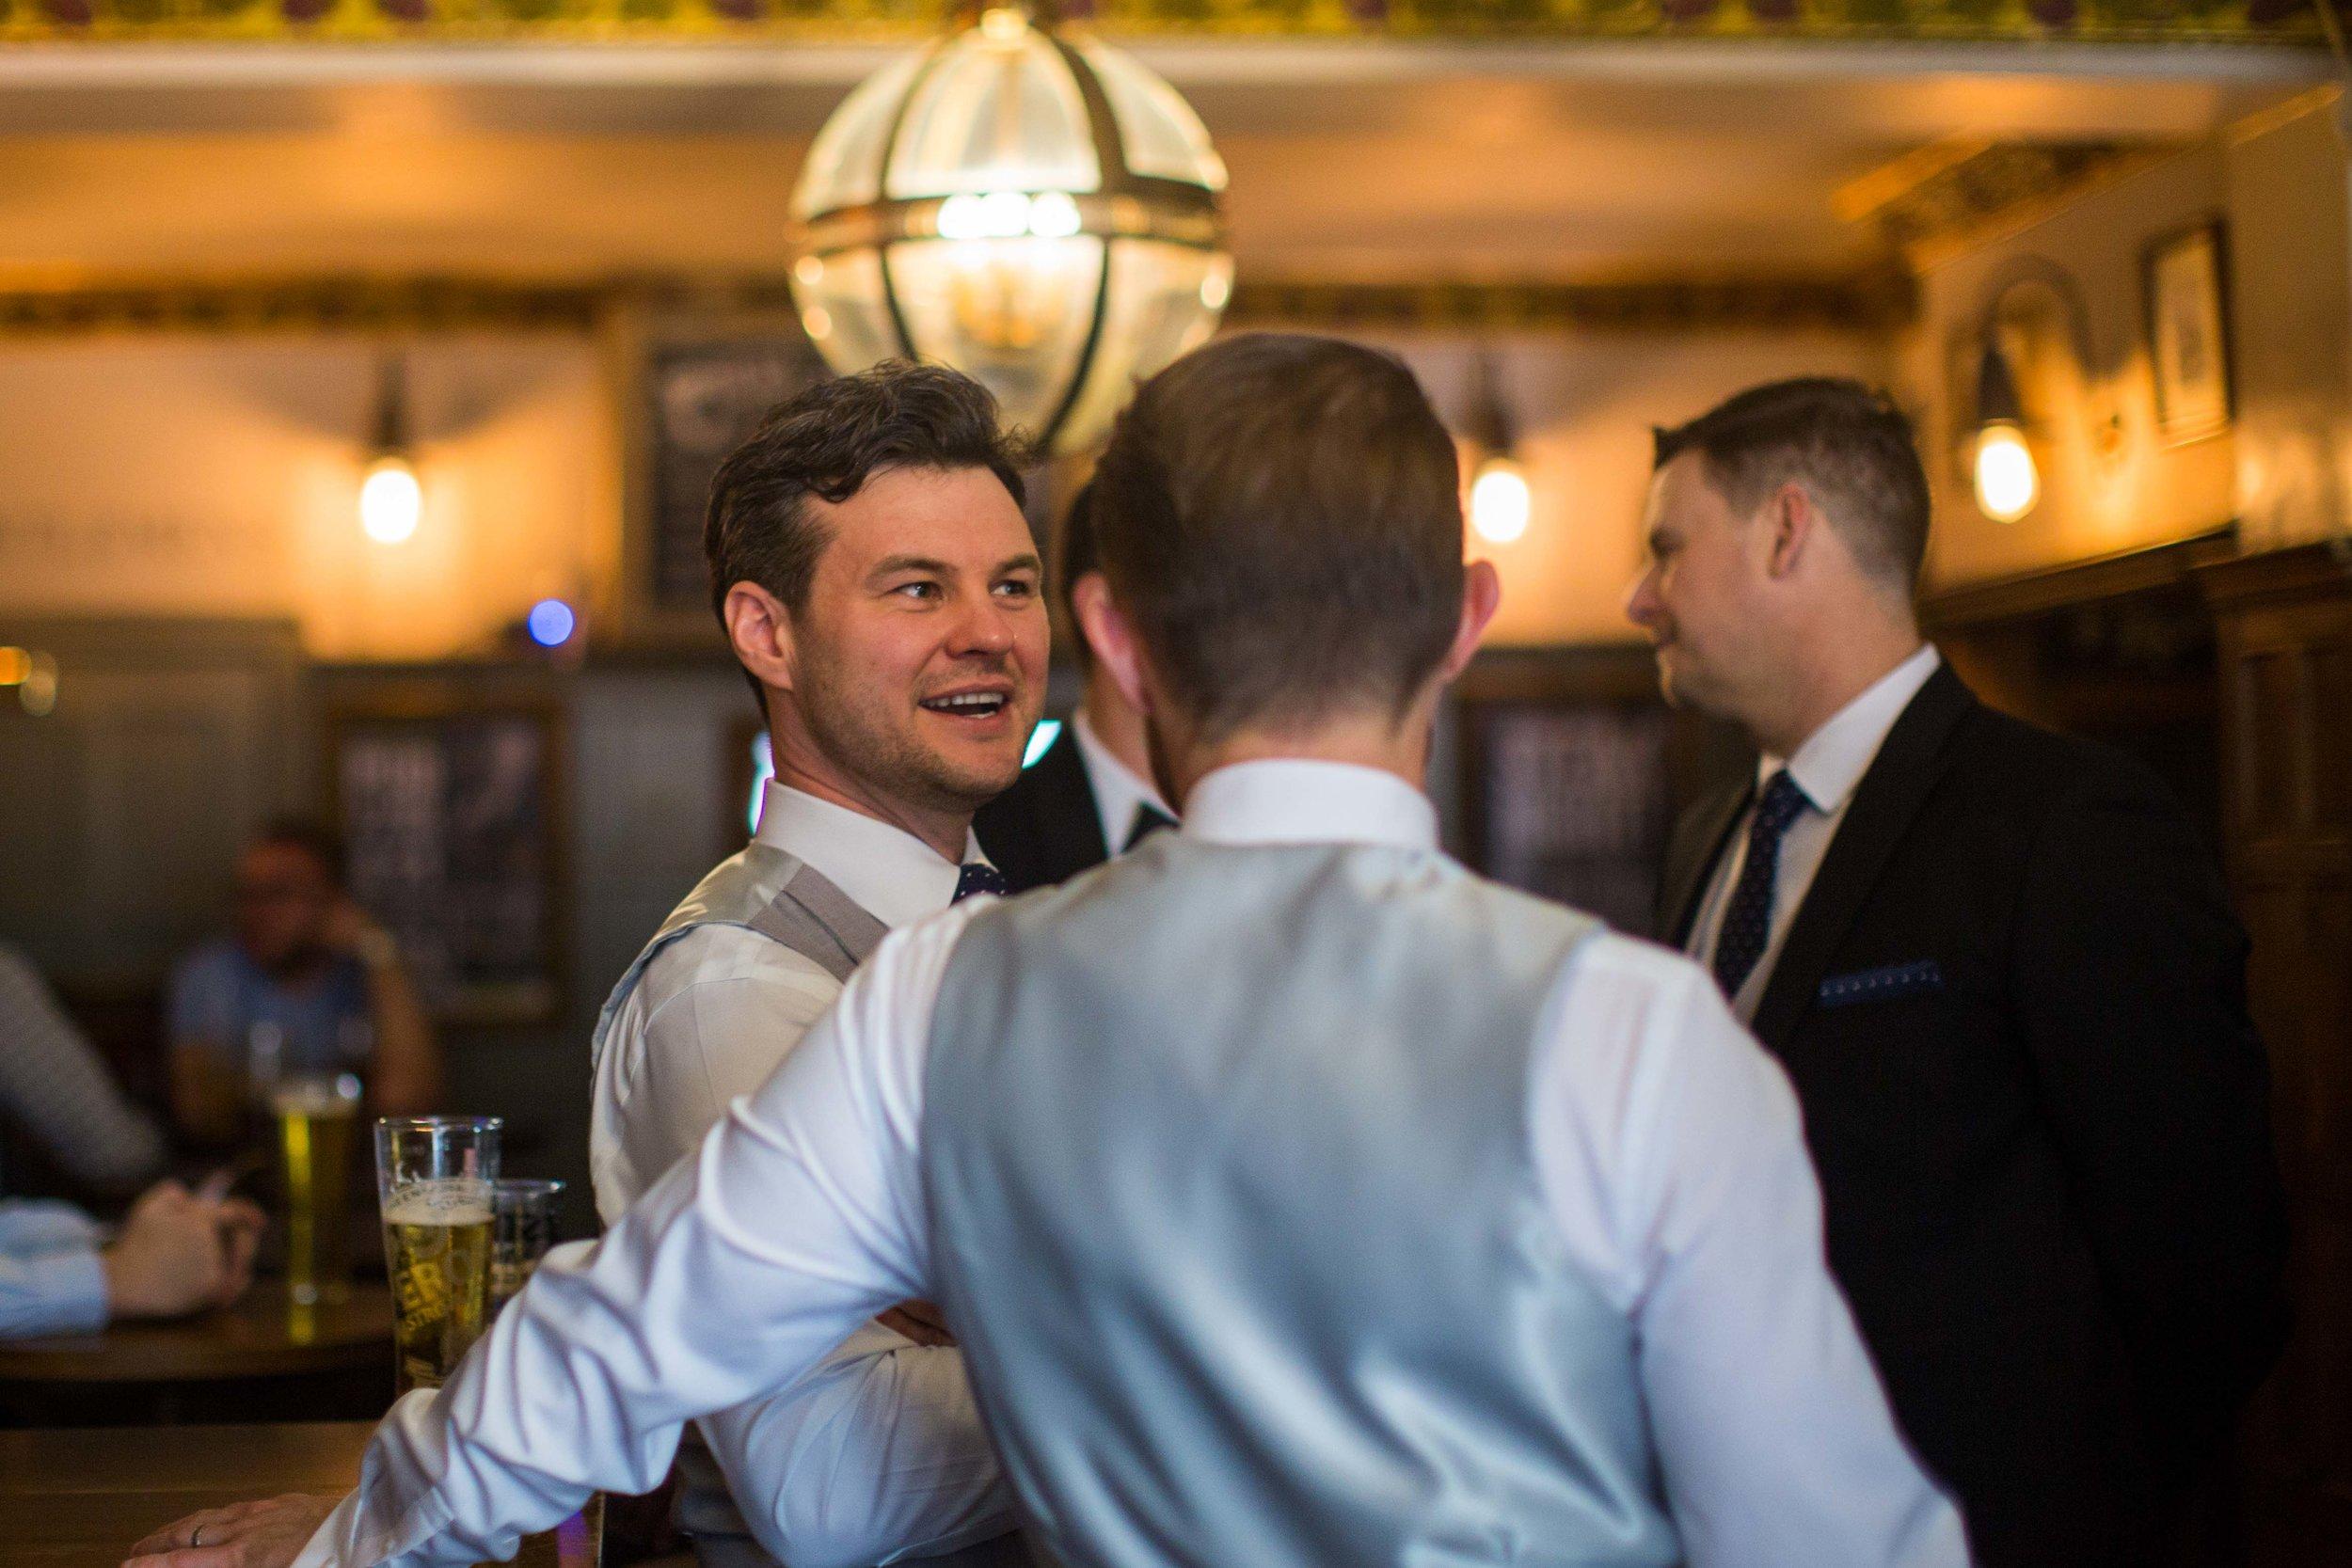 claridges-hotel-wedding-photographer-london-mayfair-natalia-smith-photography-41.jpg